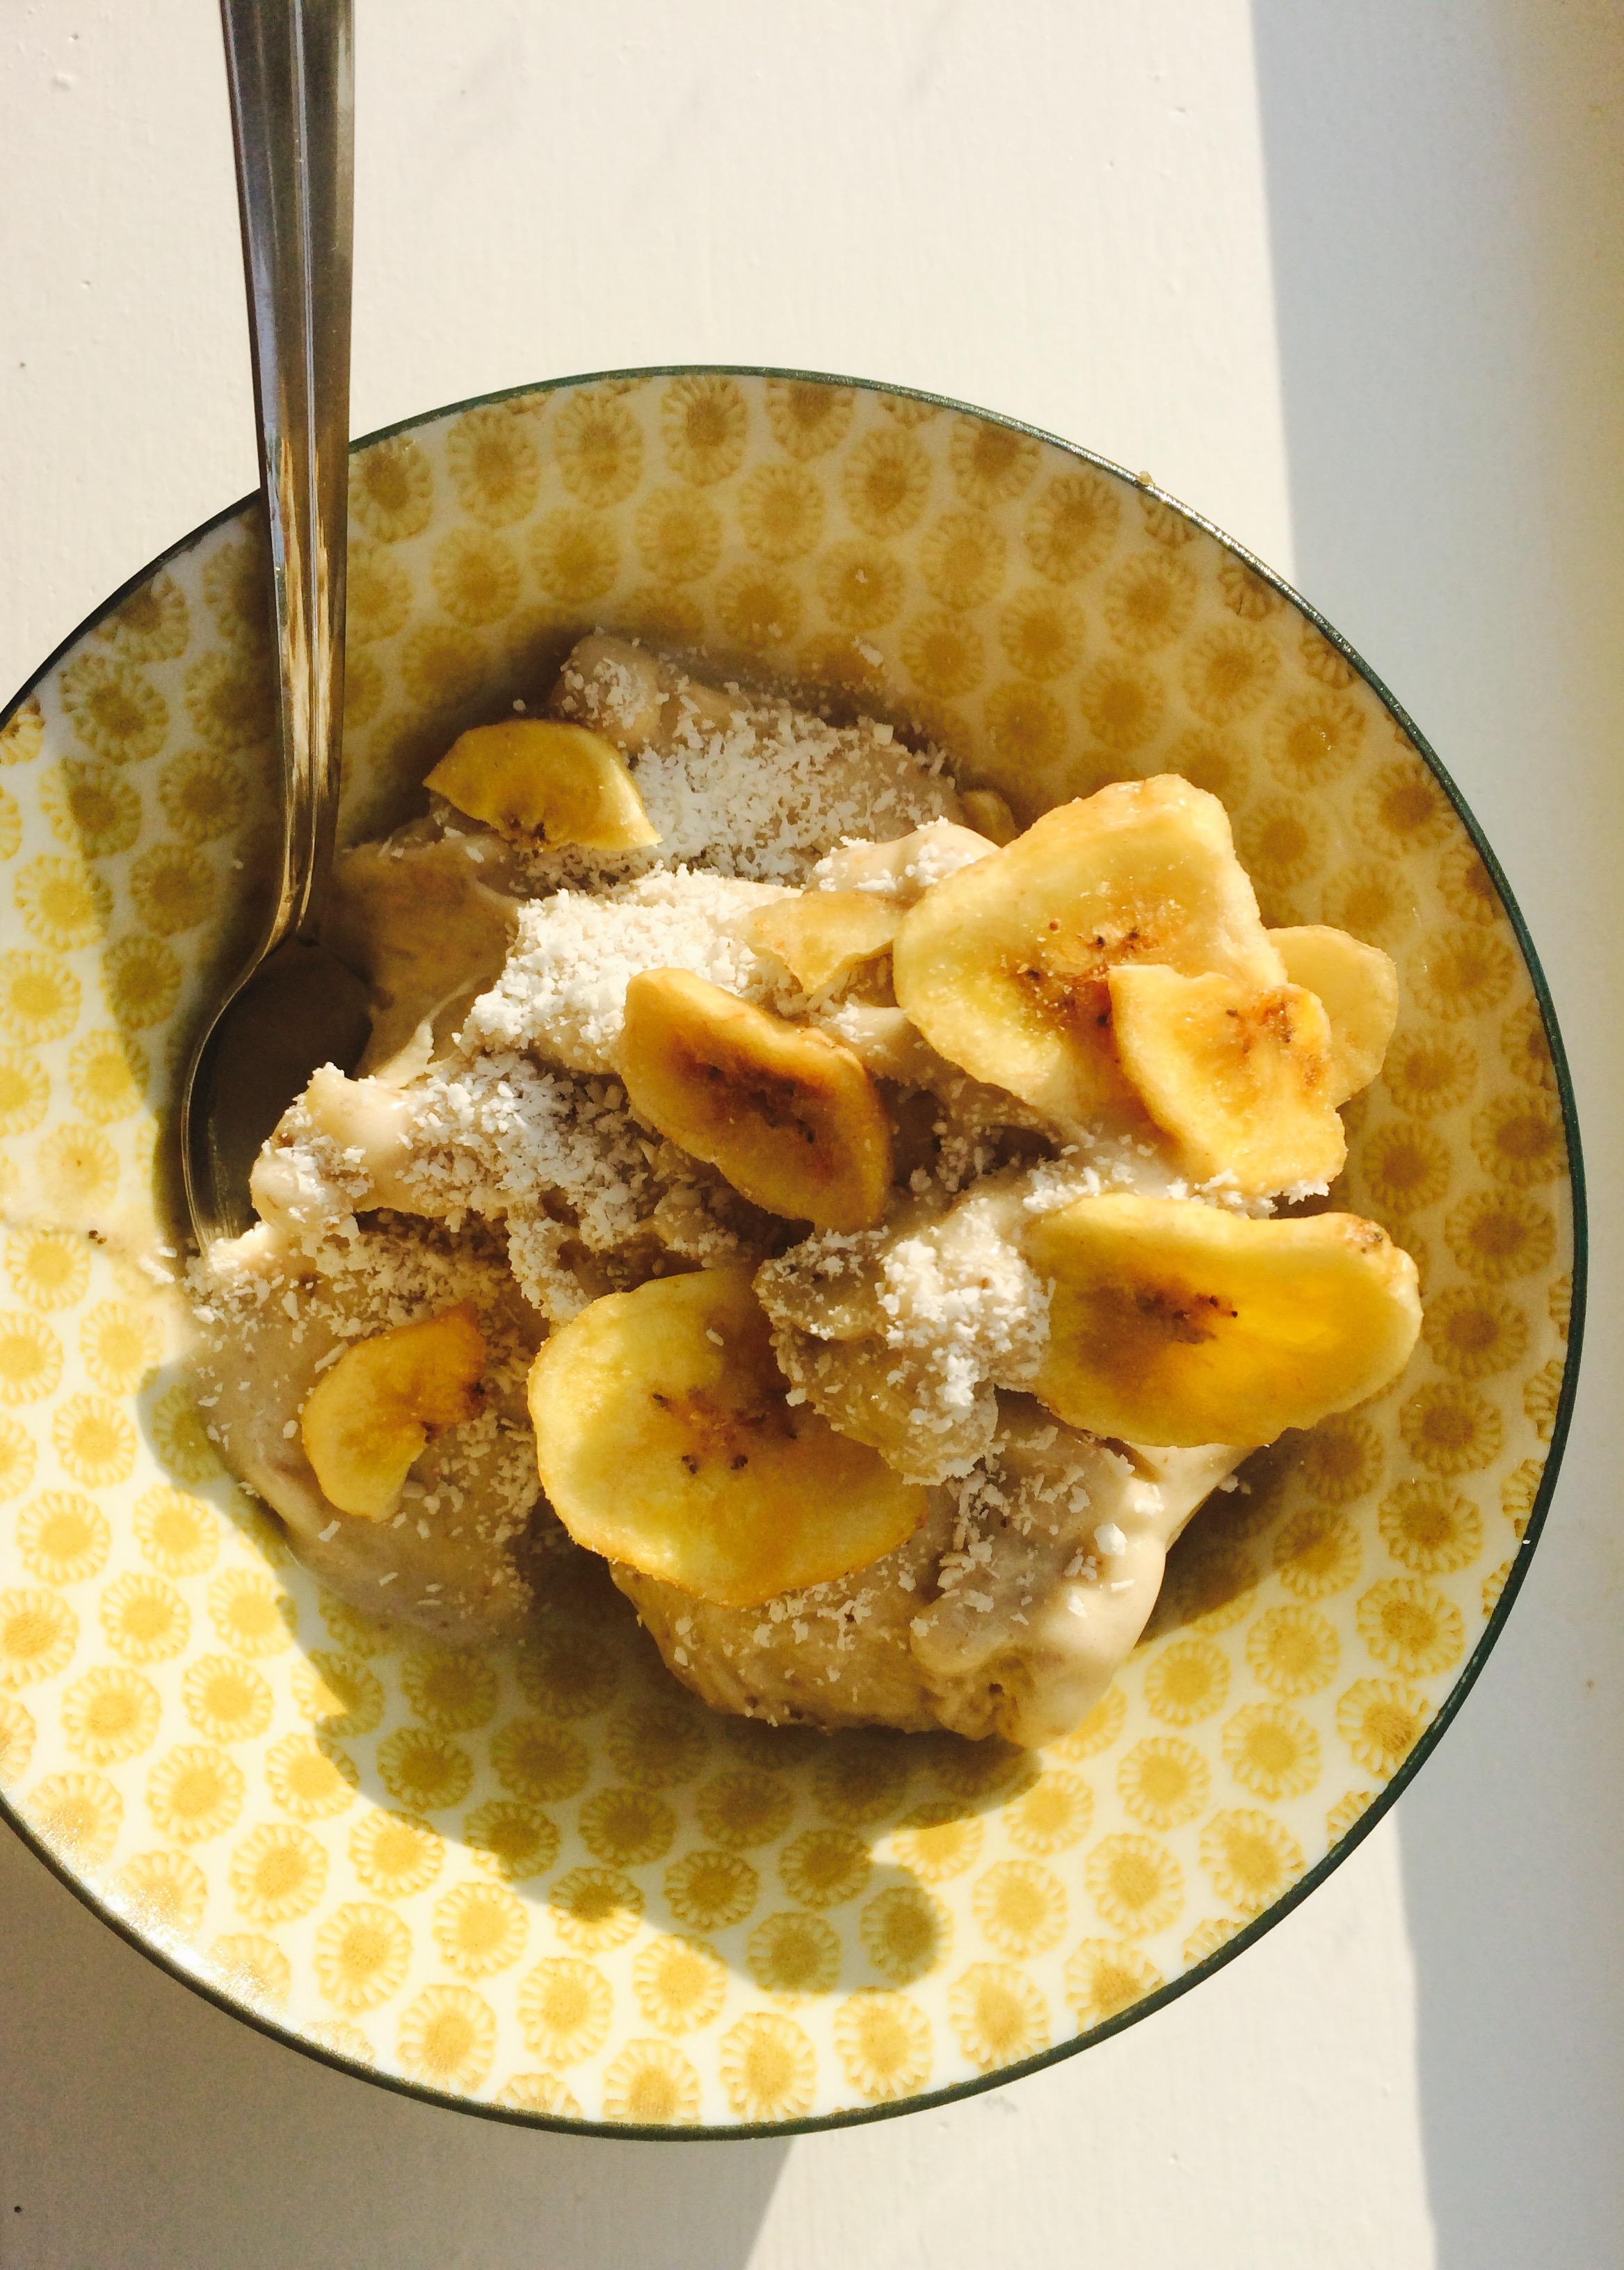 Goddelijk vegan bananenijs